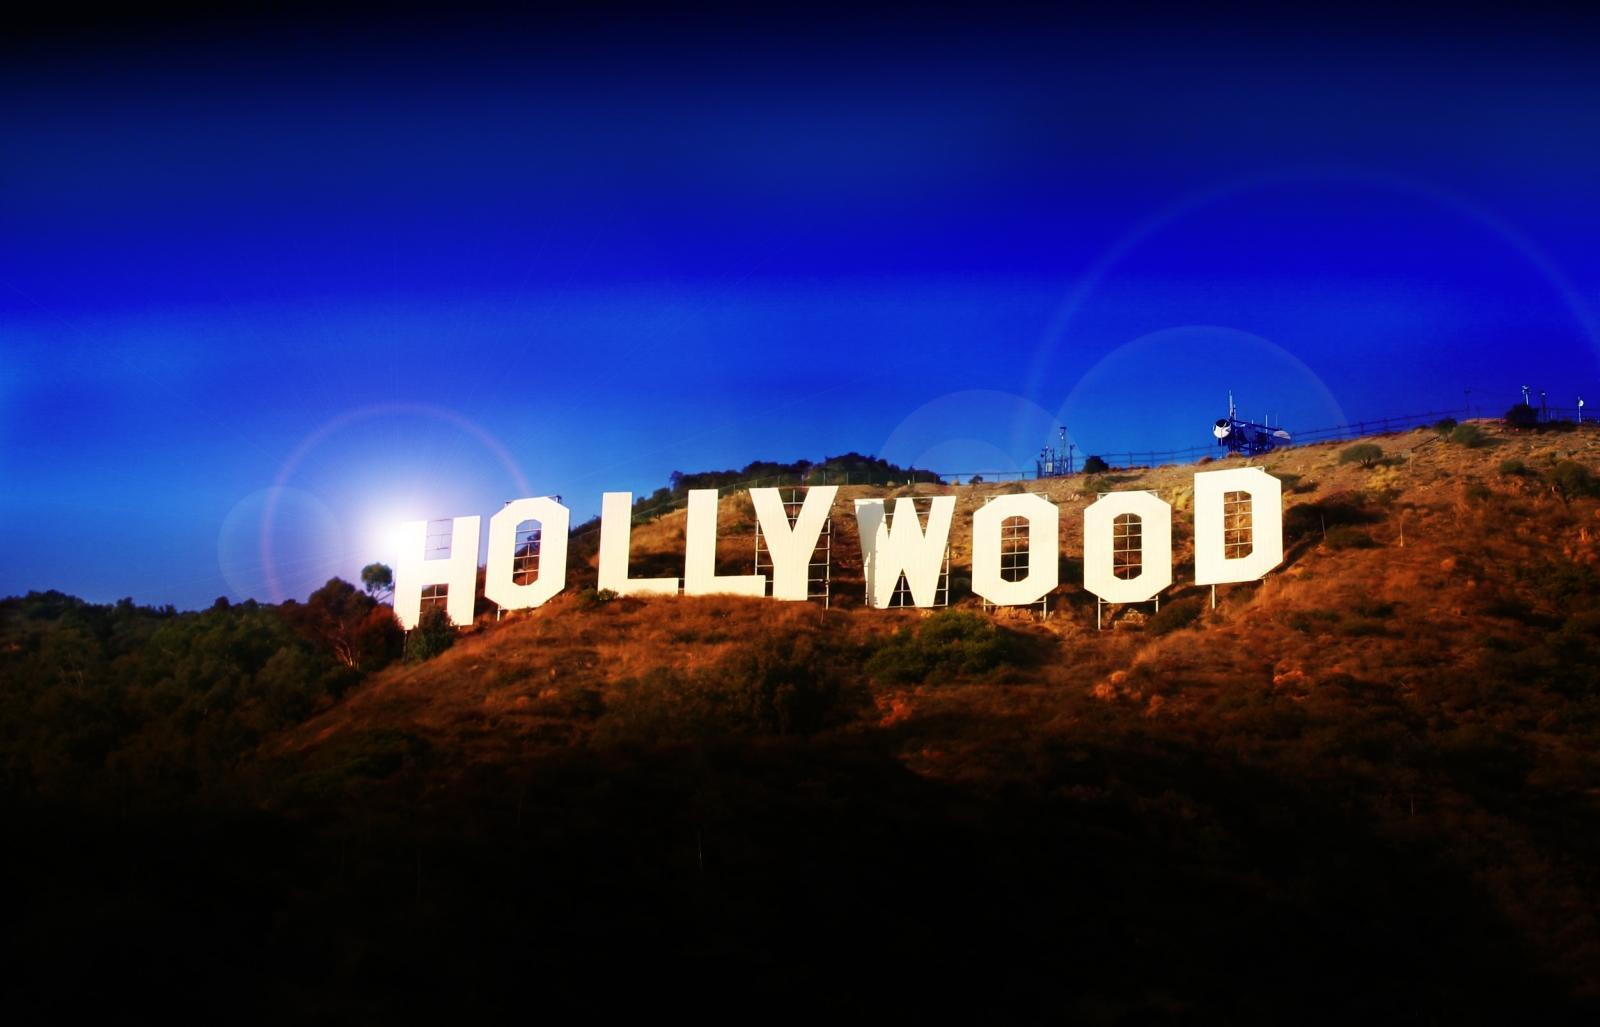 Hollywood Hills Wallpaper Desktop Backgrounds for HD Wallpaper 1600x1027